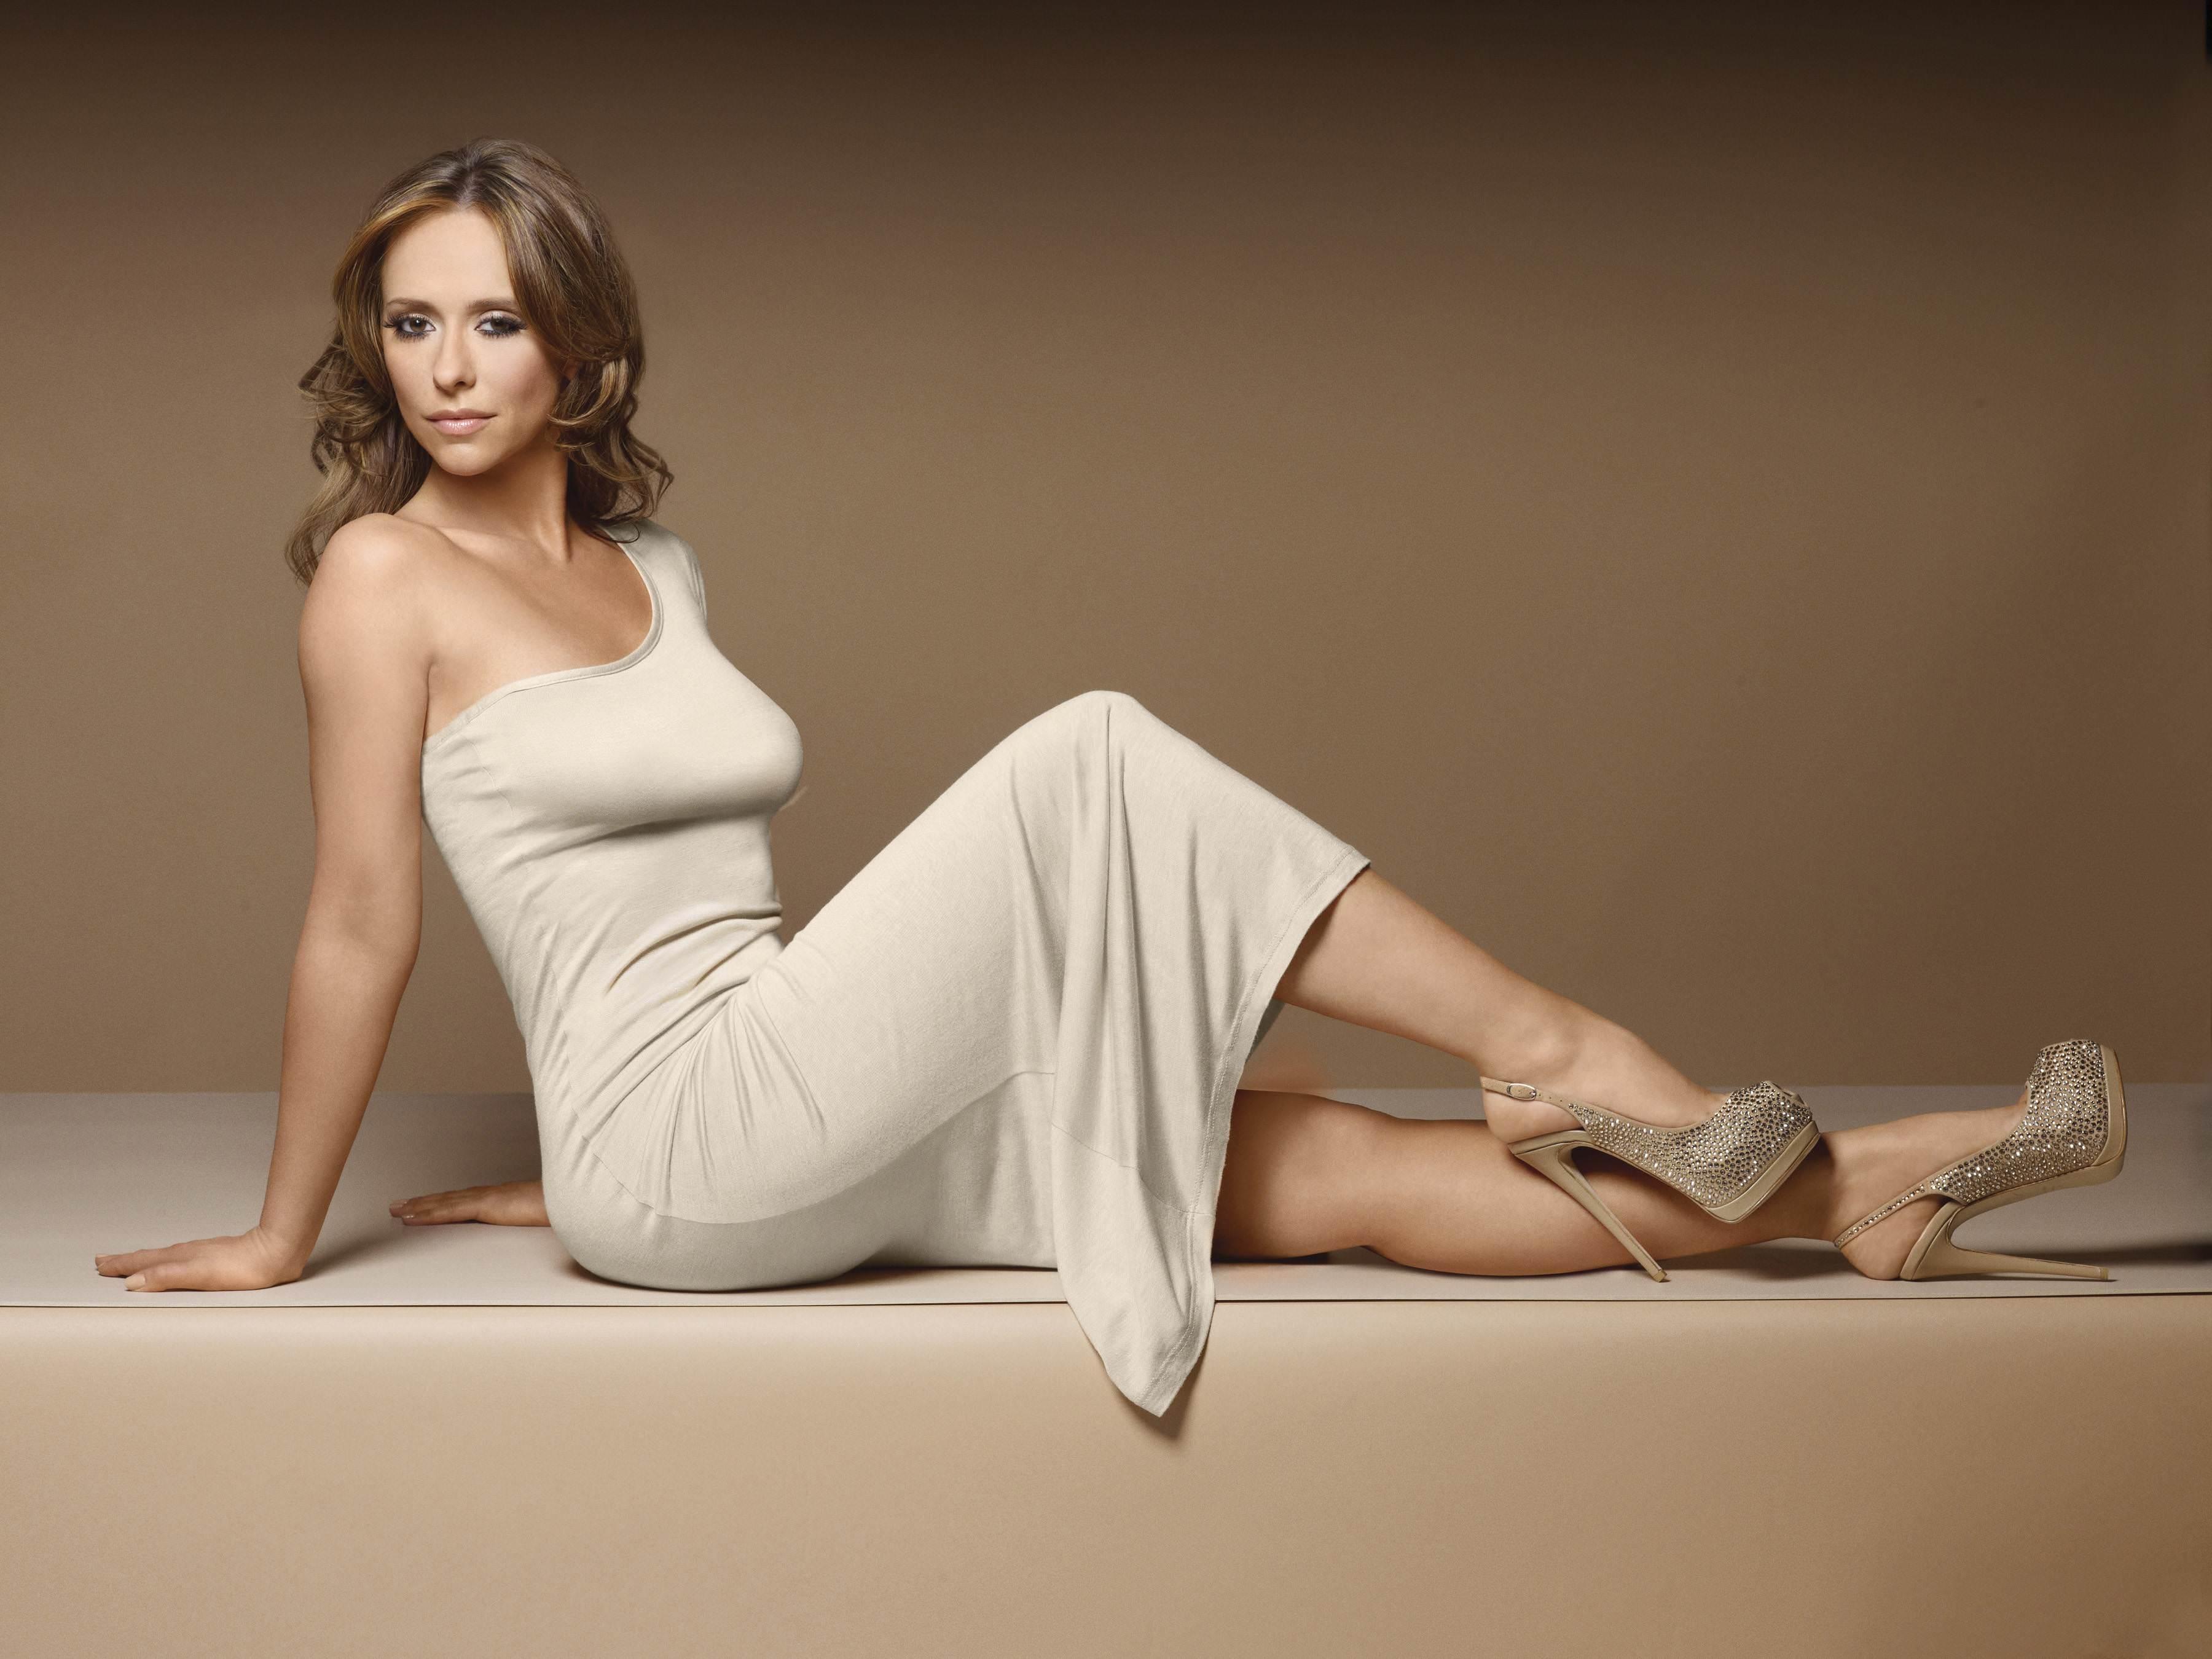 Jennifer Love Hewitt 4k